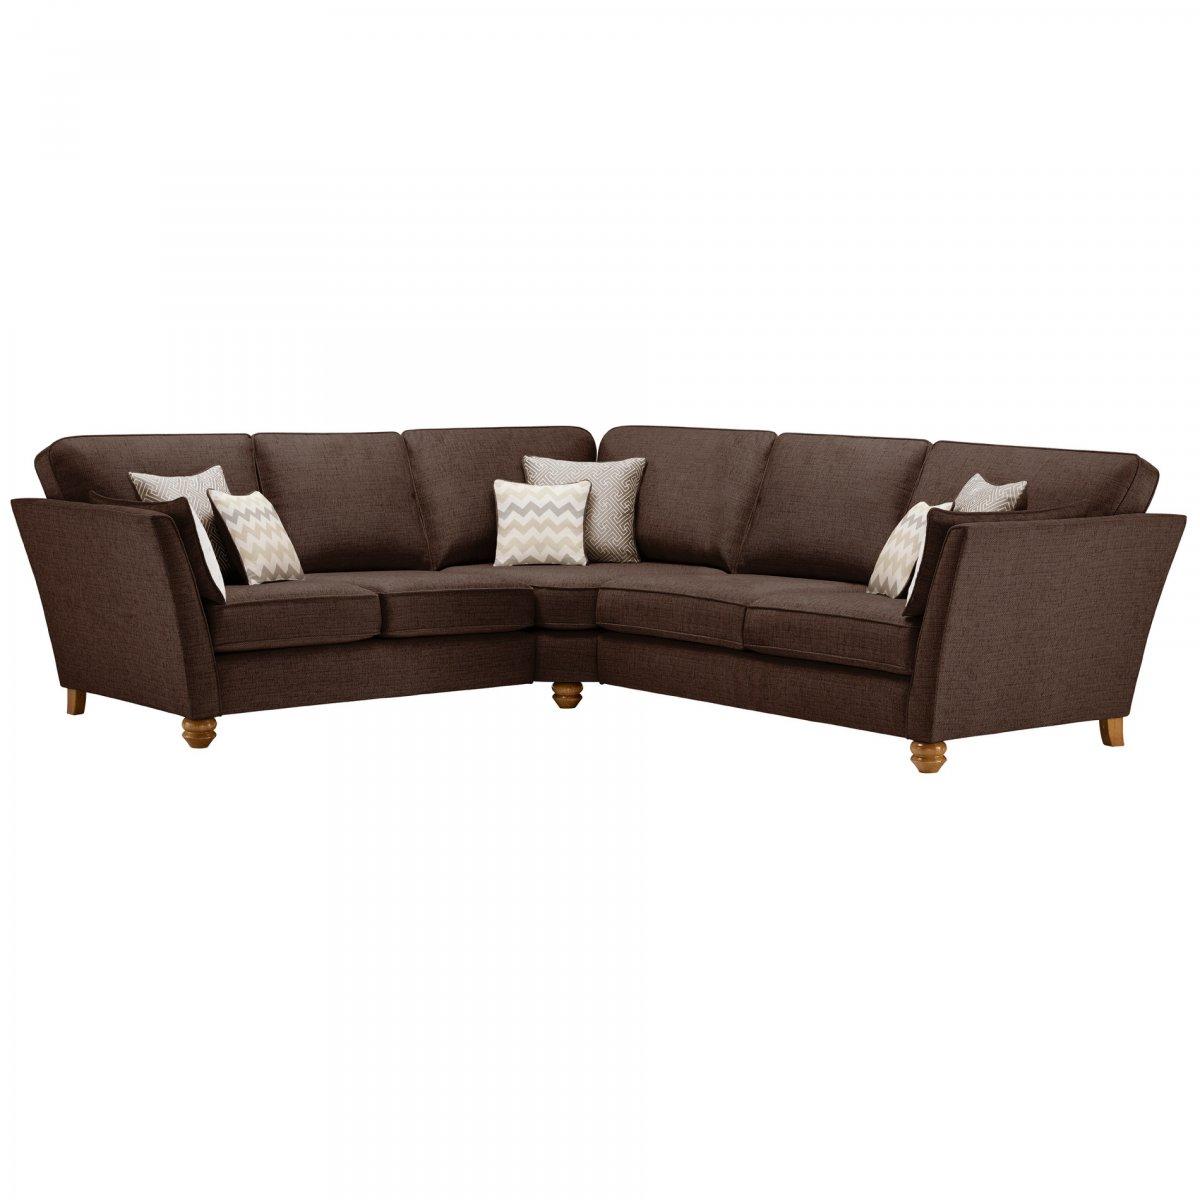 gainsborough large corner sofa in brown beige scatters. Black Bedroom Furniture Sets. Home Design Ideas